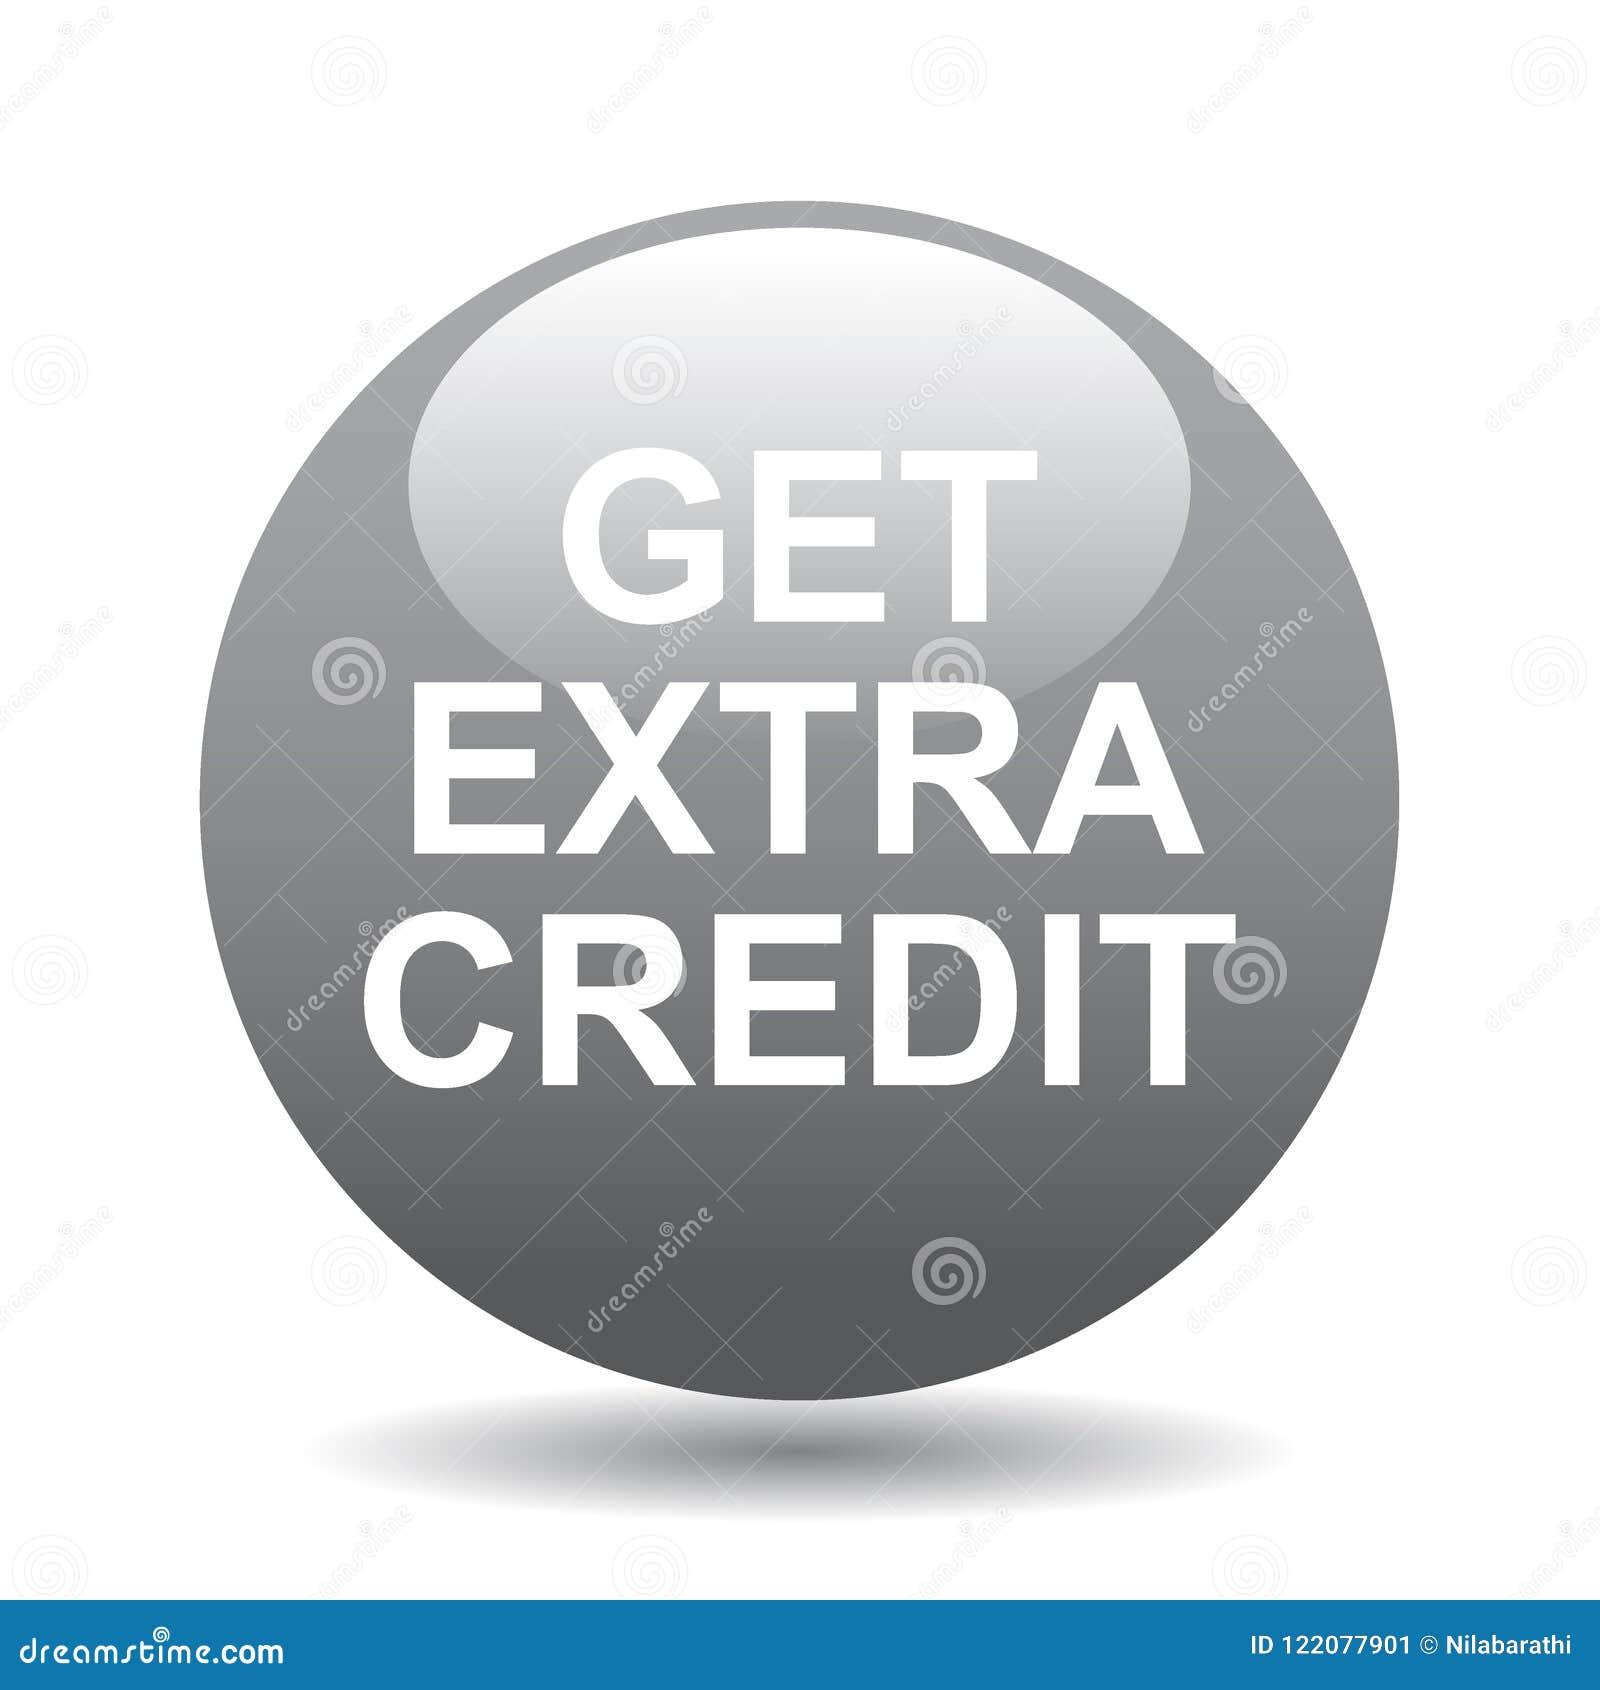 Get extra credit